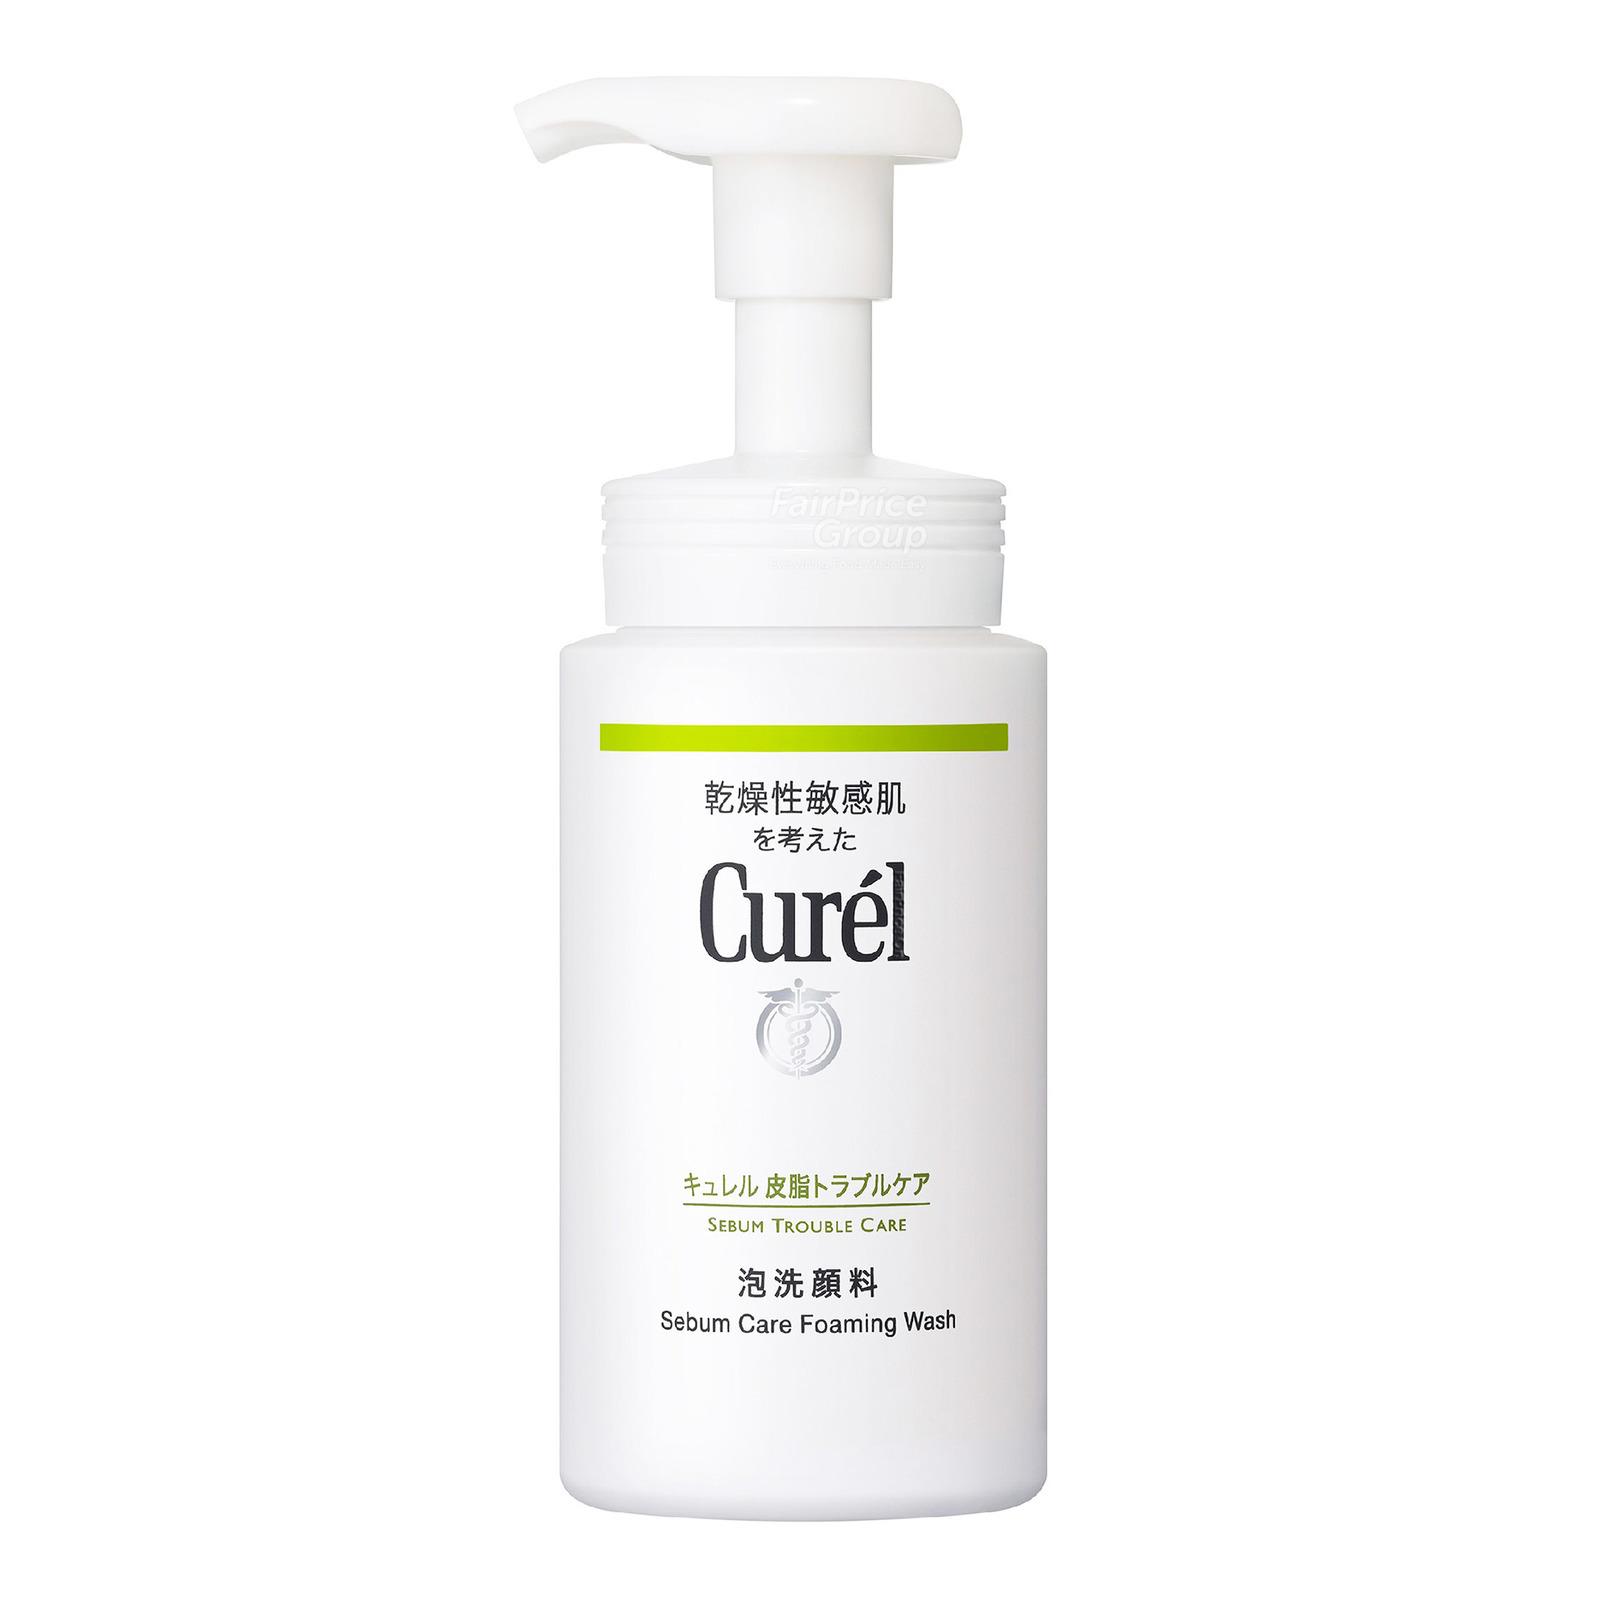 Curel Sebum Care Foaming Wash